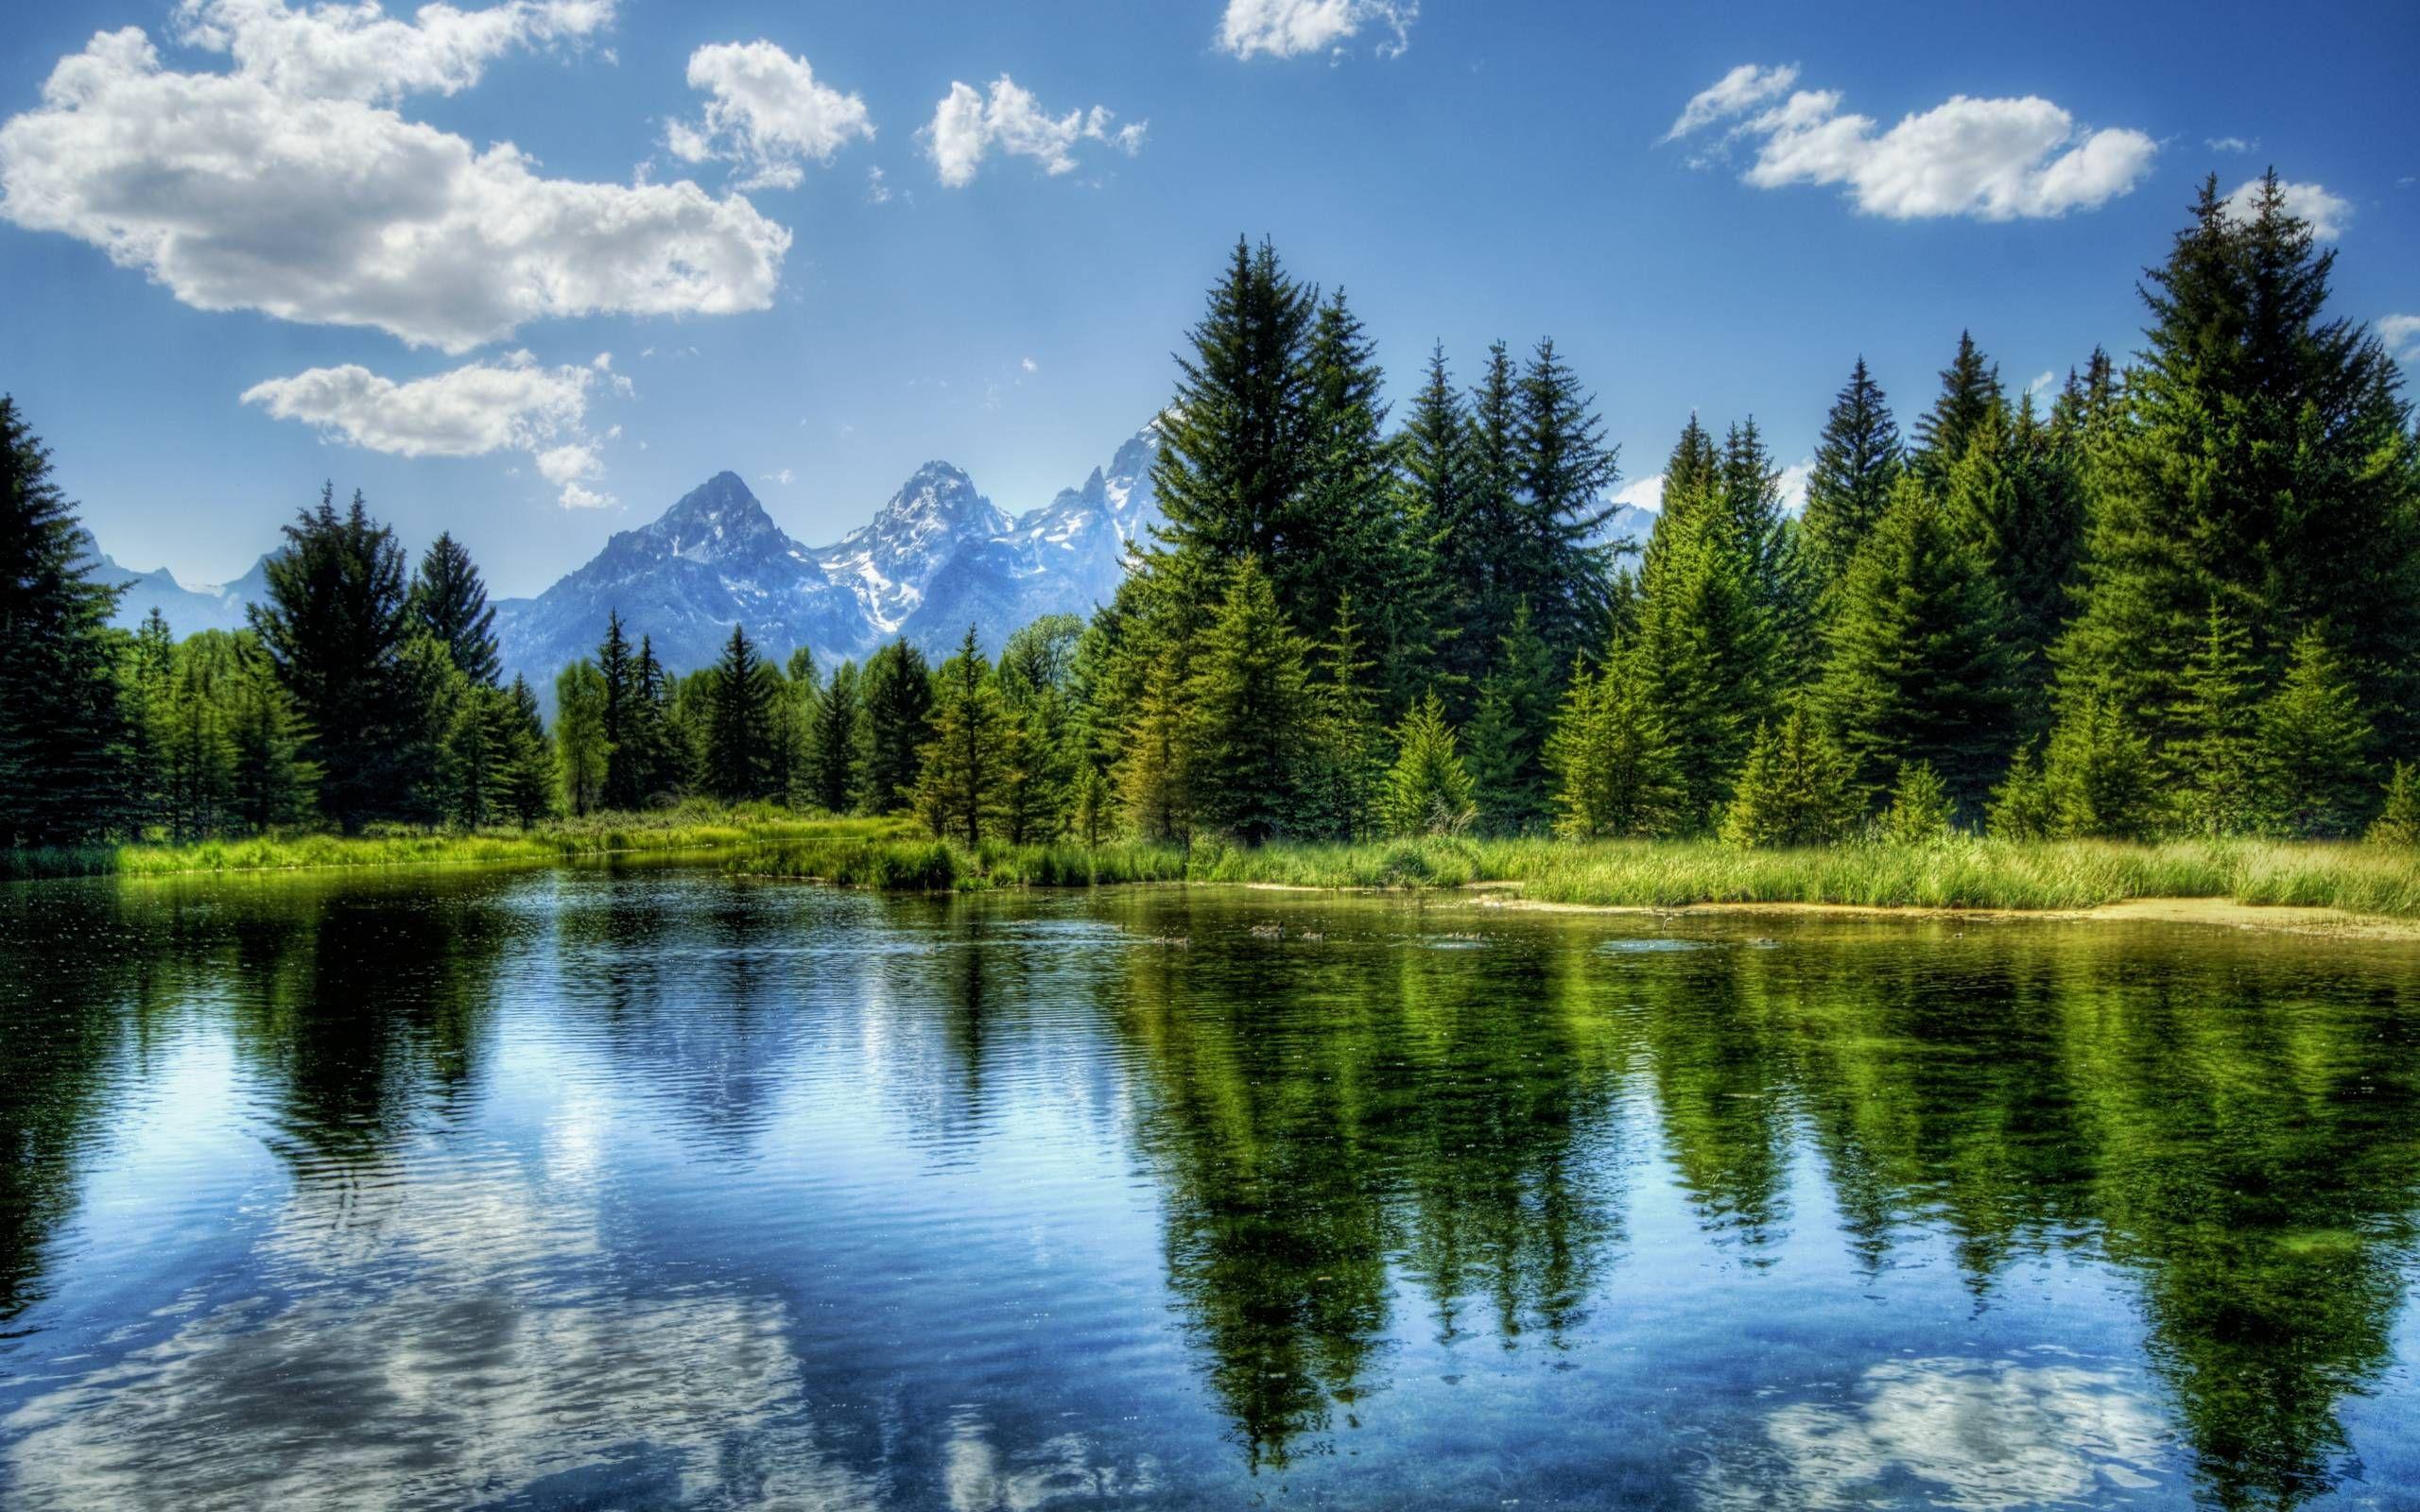 Landscape | Landscaping, Beautiful landscapes and Landscape wallpaper